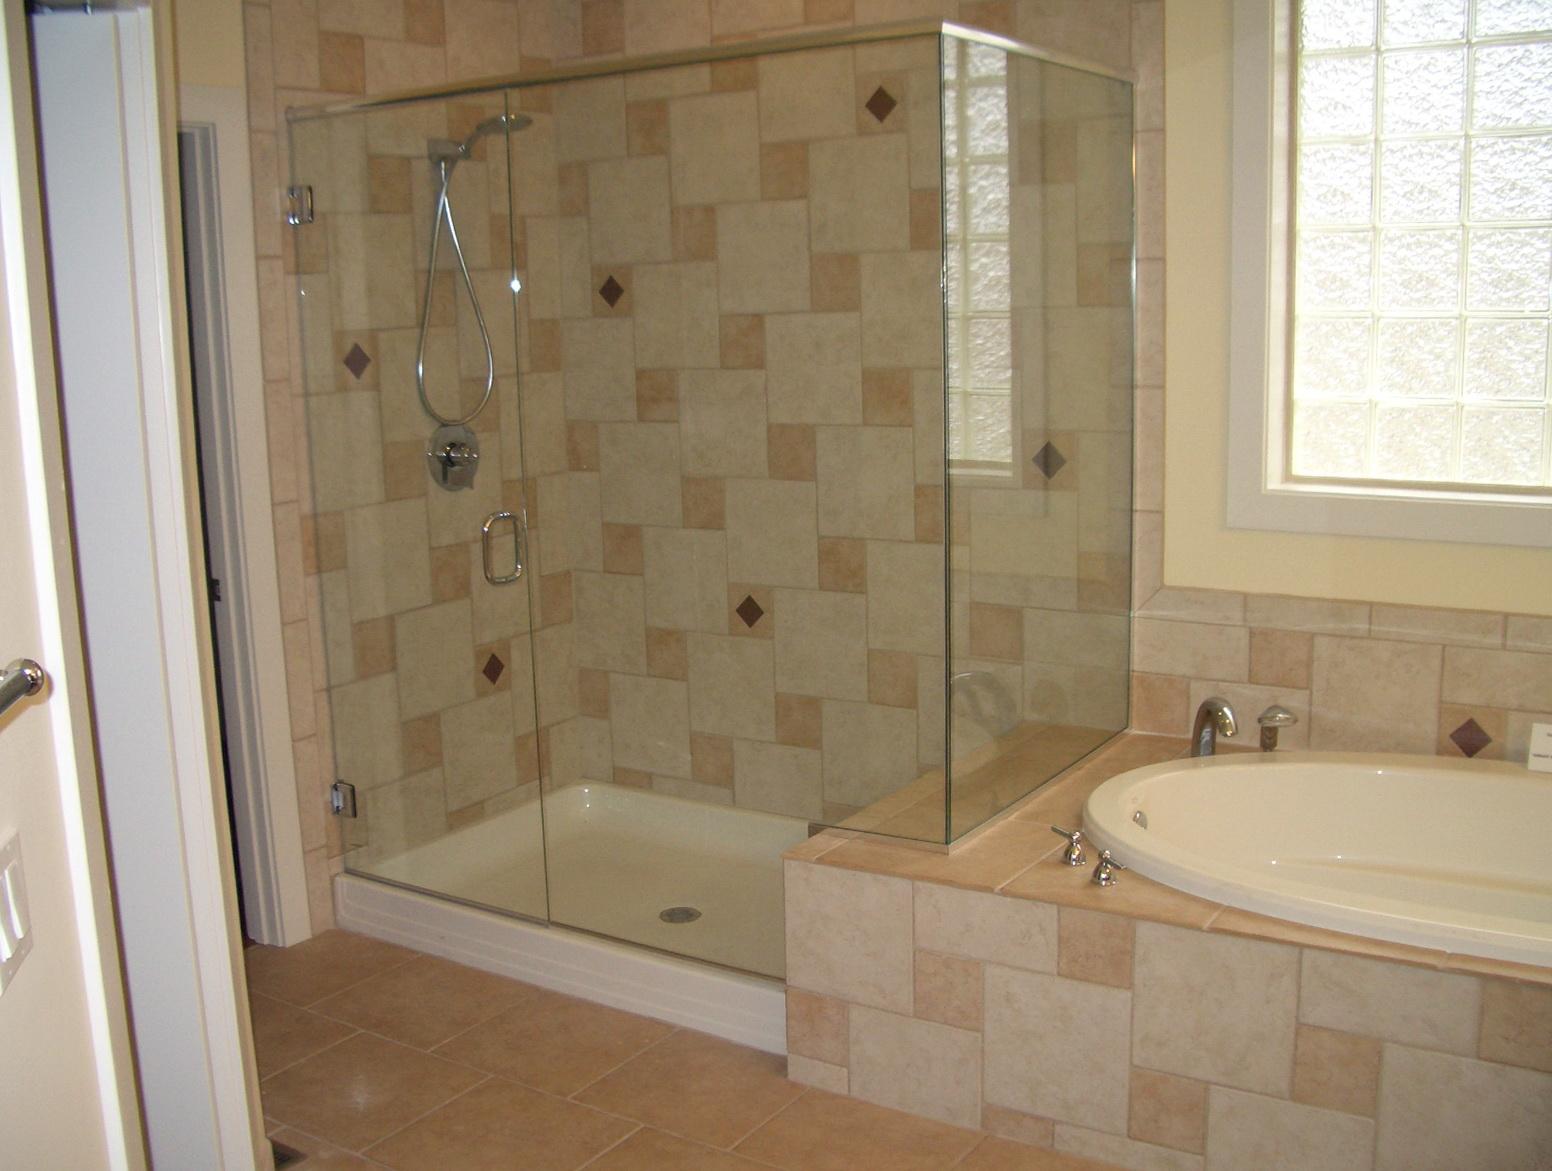 Small Bathroom Remodel Ideas Window In Shower